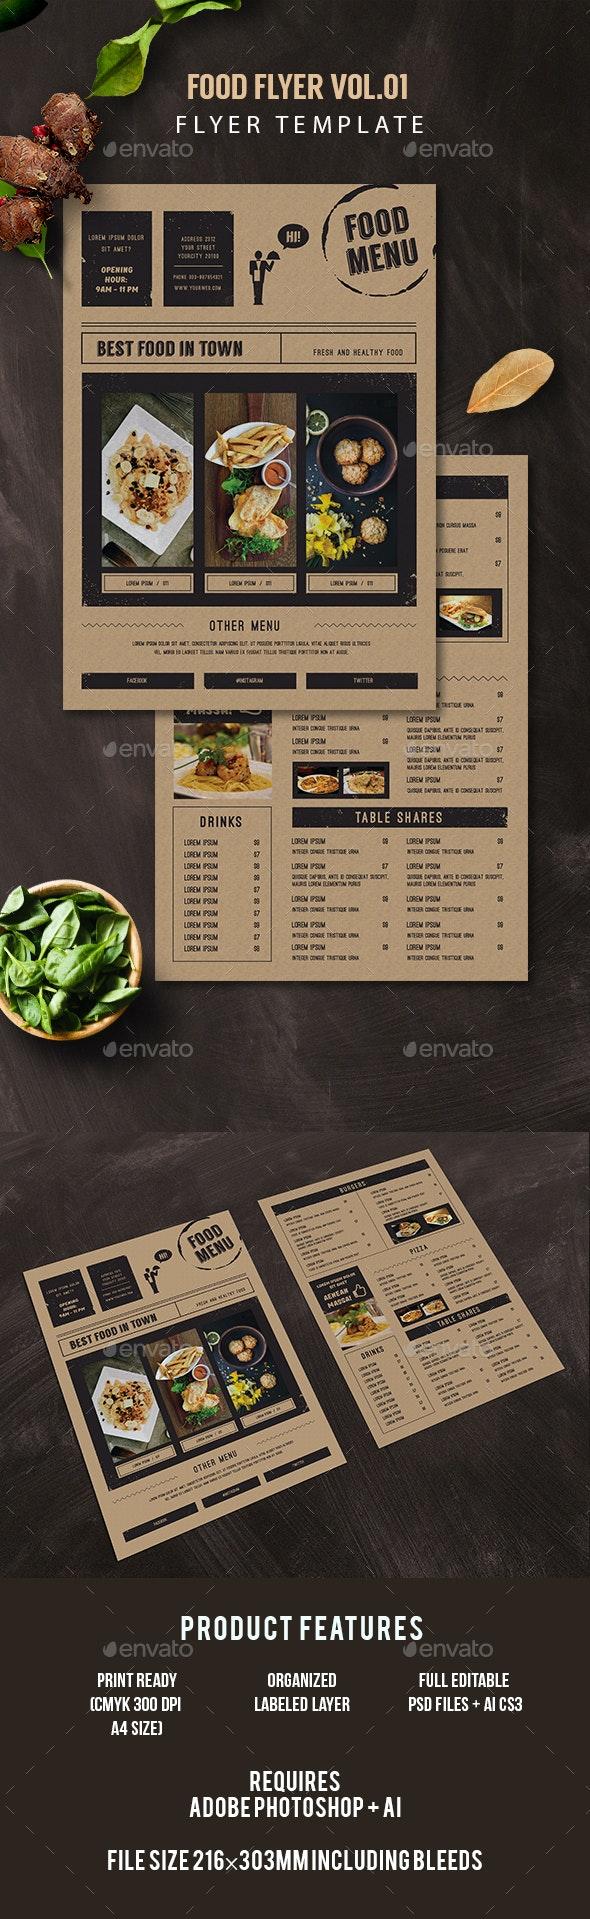 Food Flyer - Restaurant Flyers